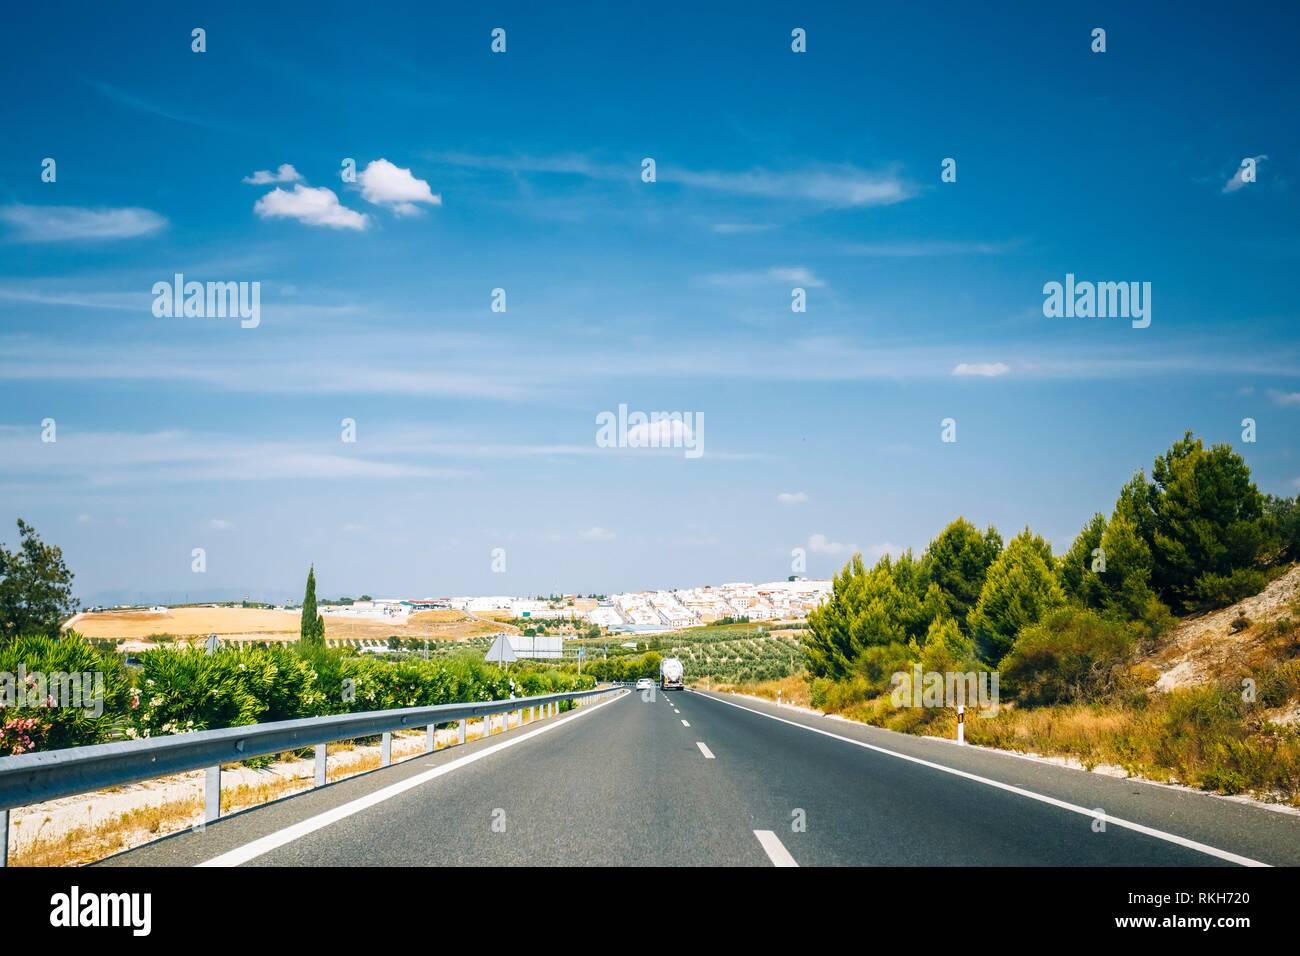 Hermosa Autopista de asfalto, Autopista, carretera carretera abierta. Concepto de viaje por carretera. Foto de stock